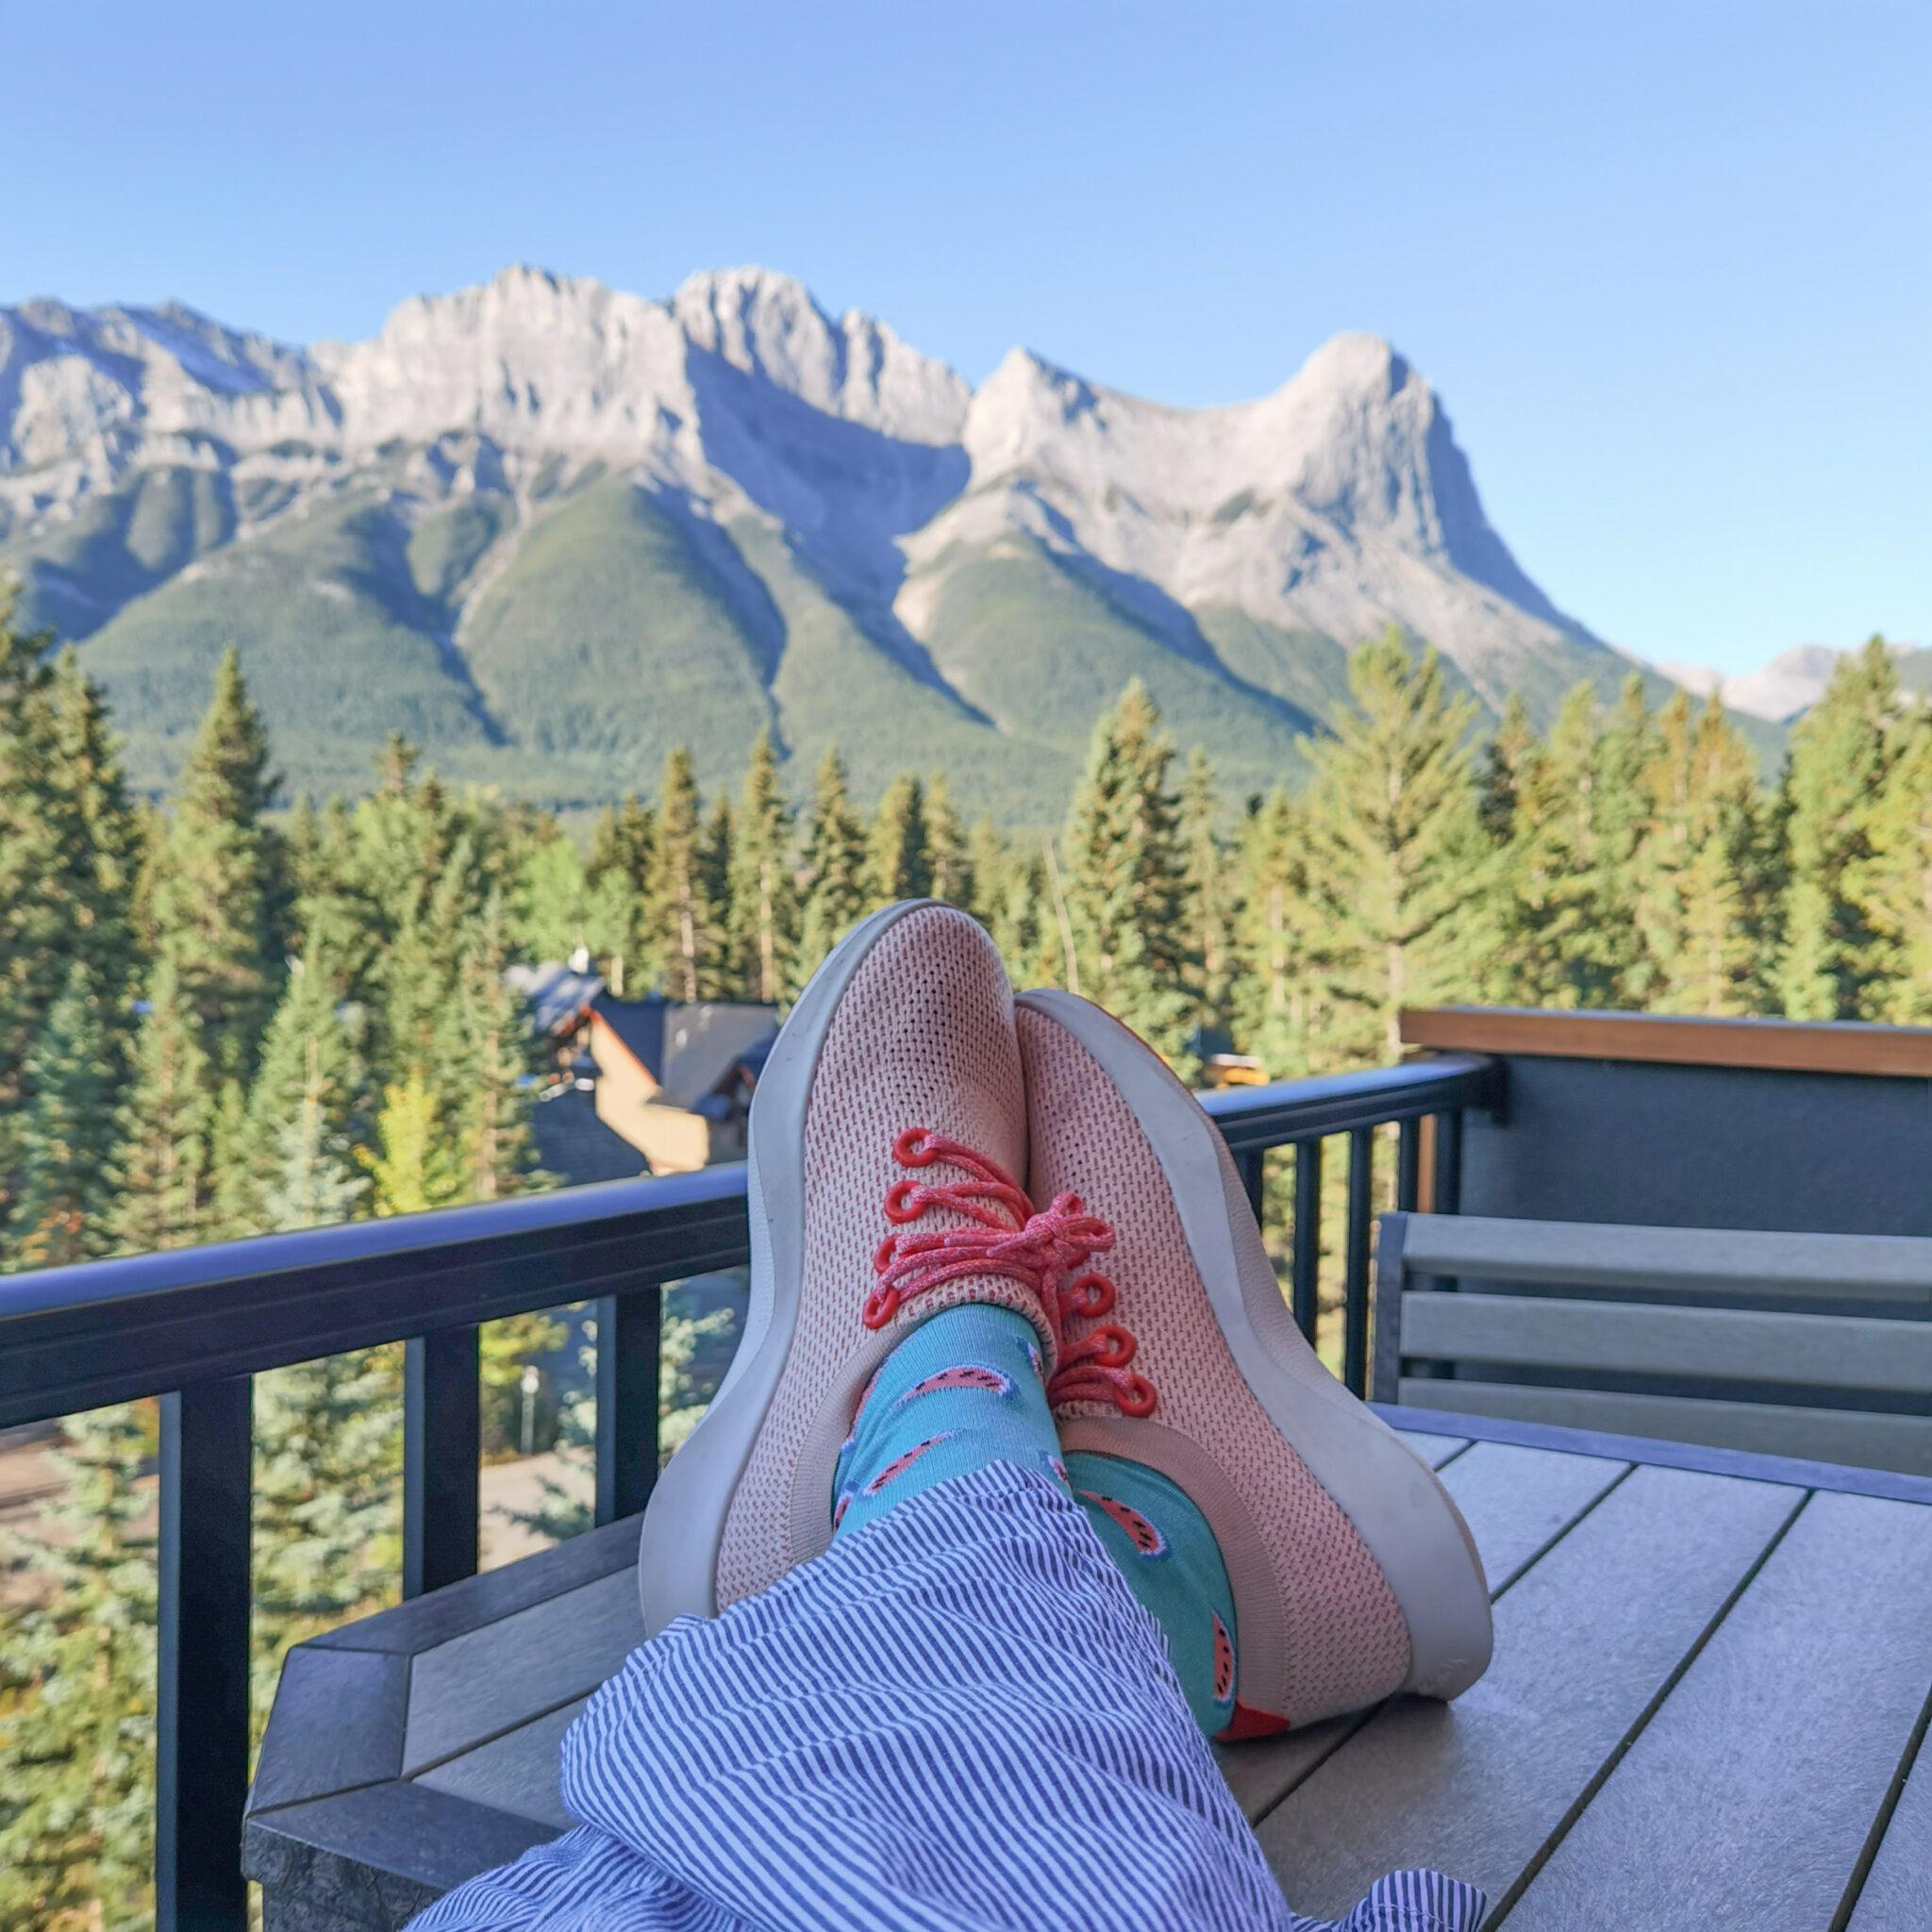 Hotel Malcolm Canmore Alberta - Canadian Rockies - Allbirds